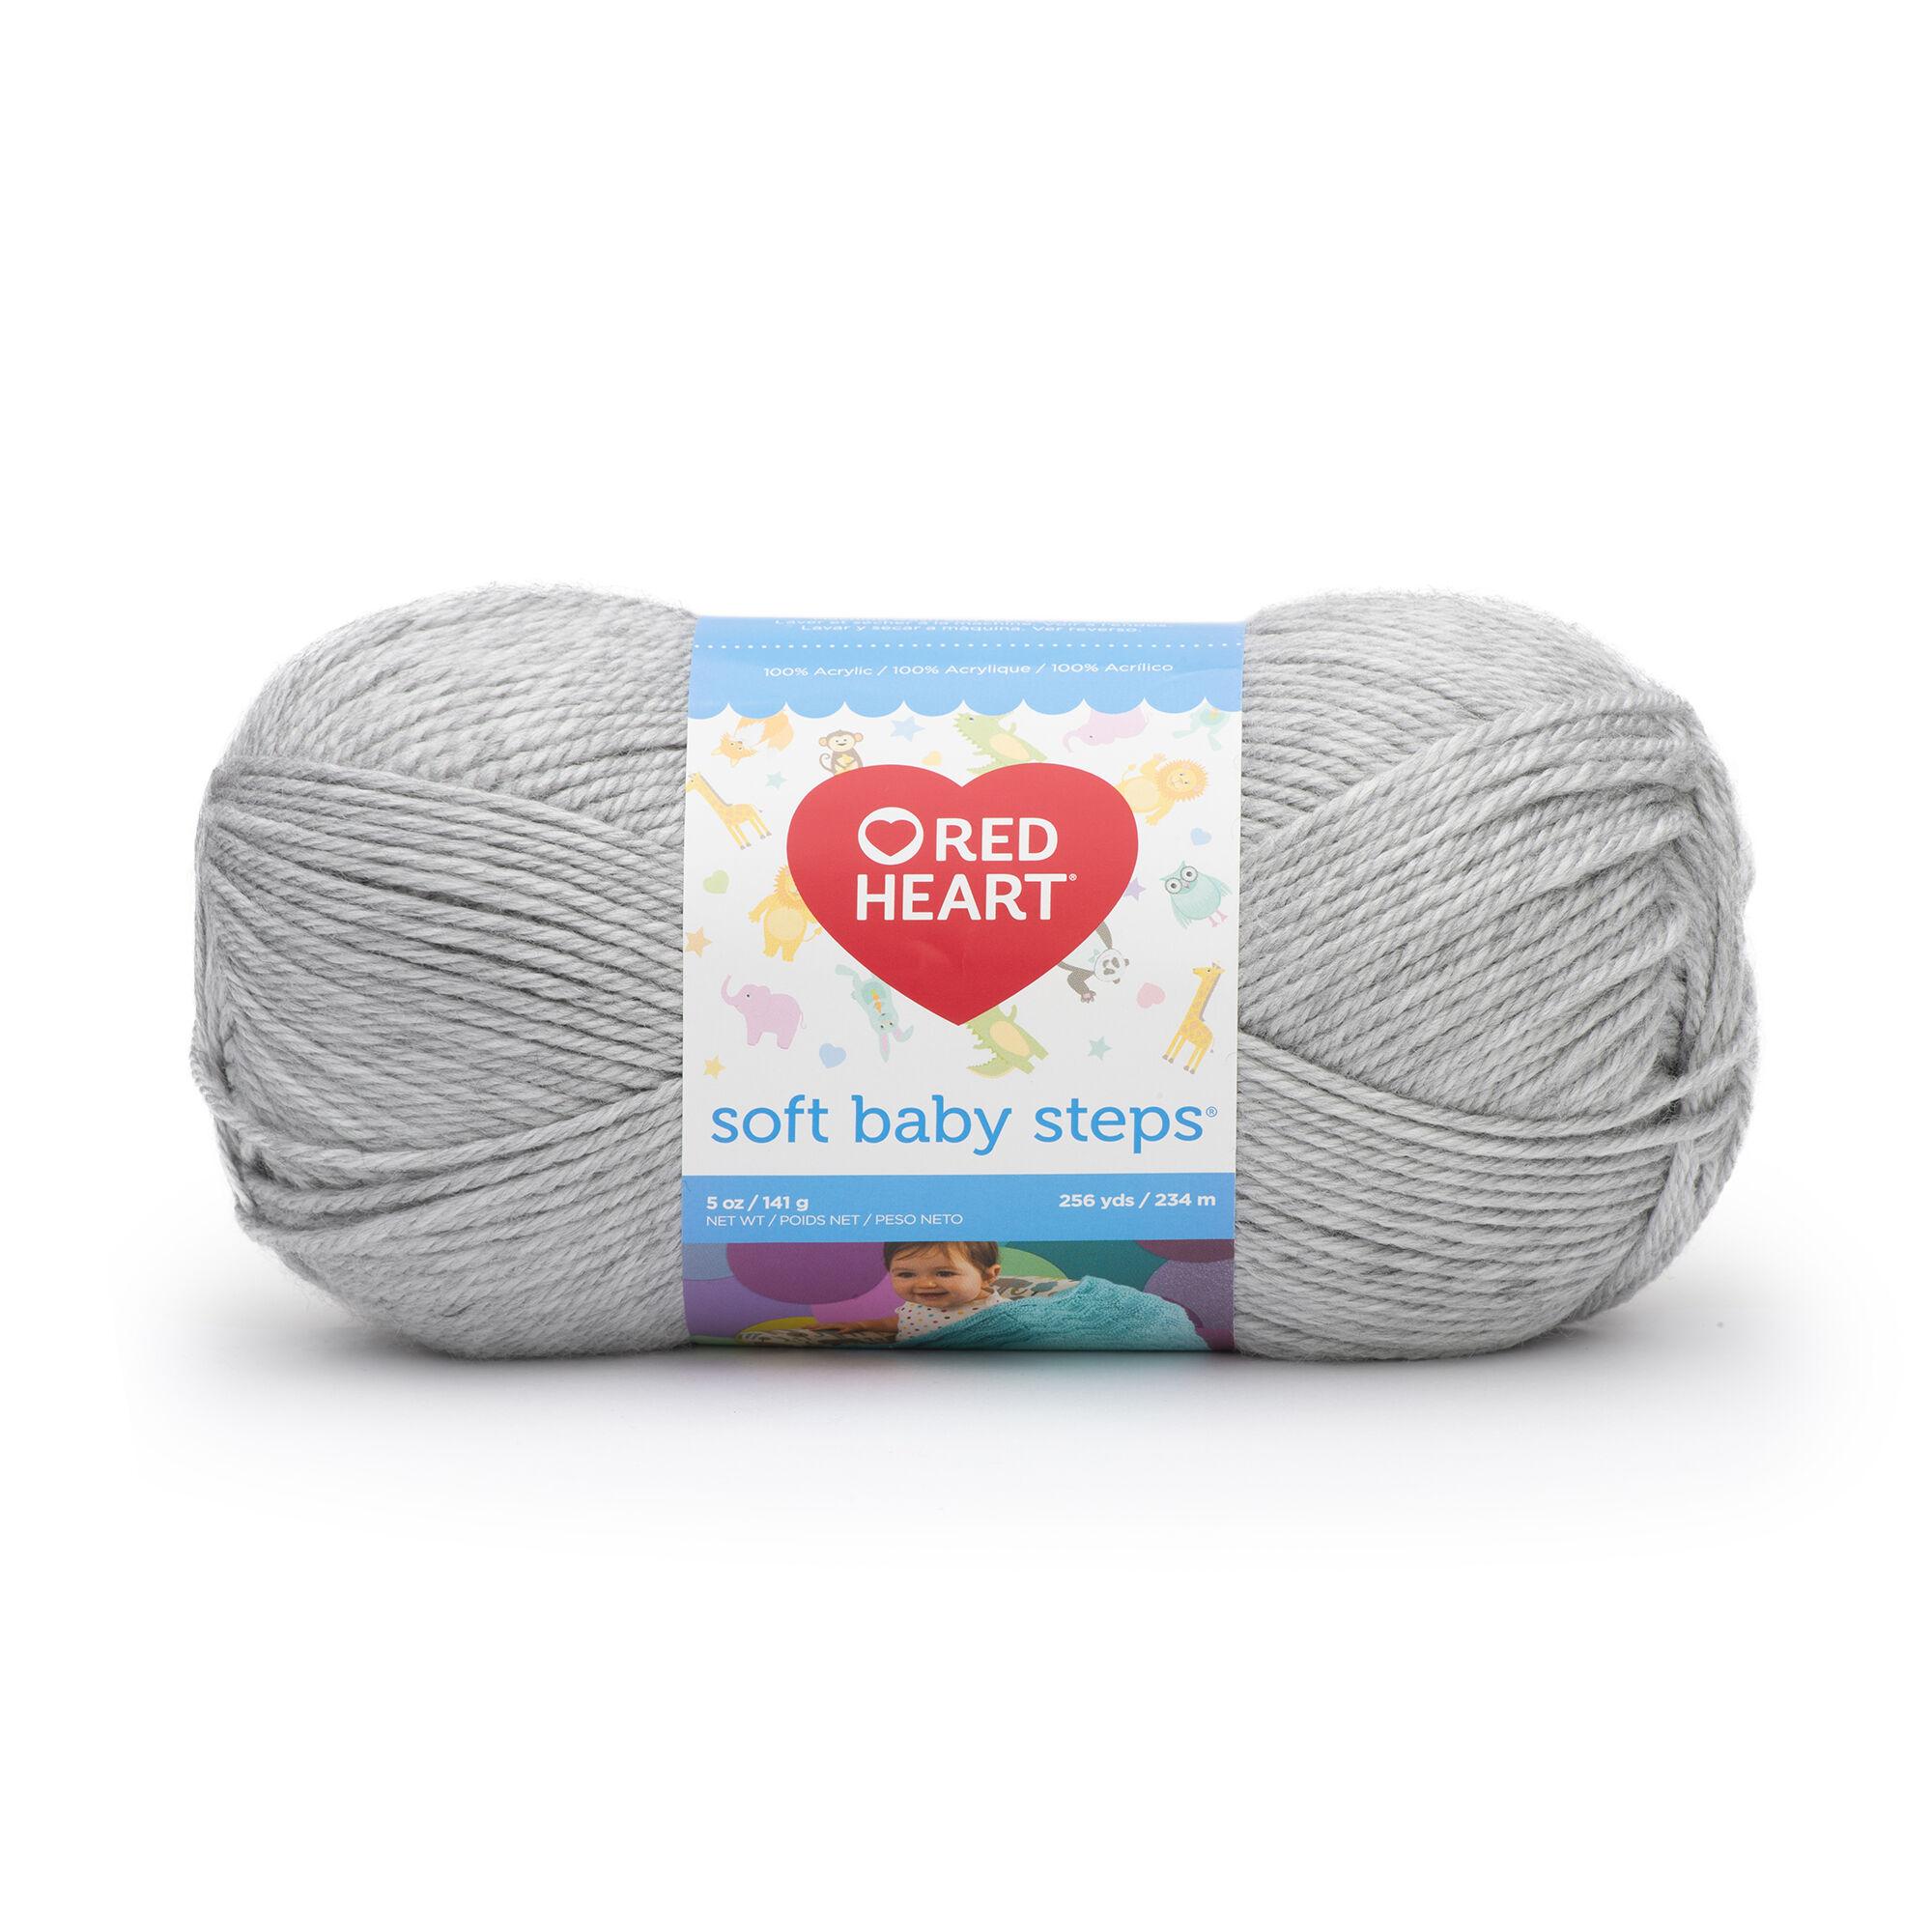 Red Heart Soft Baby Steps Yarn Elephant Yarnspirations